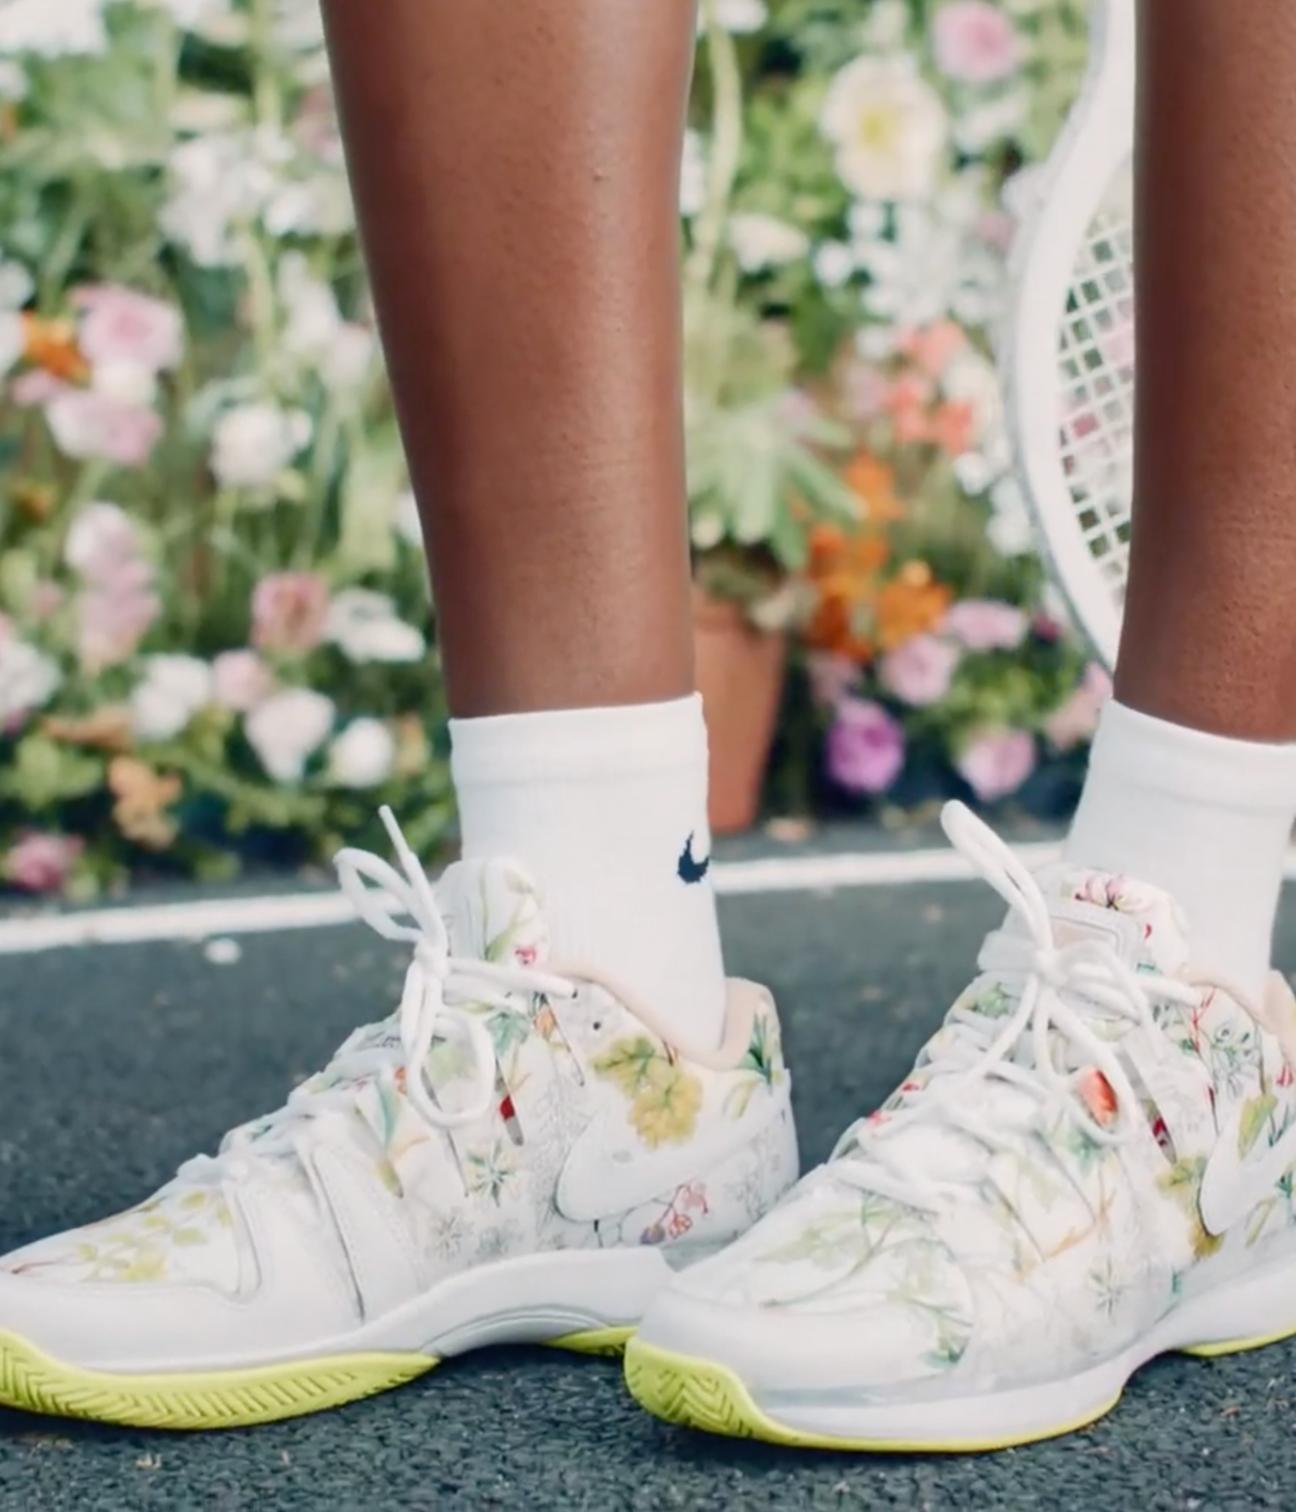 Nike Court x Liberty London